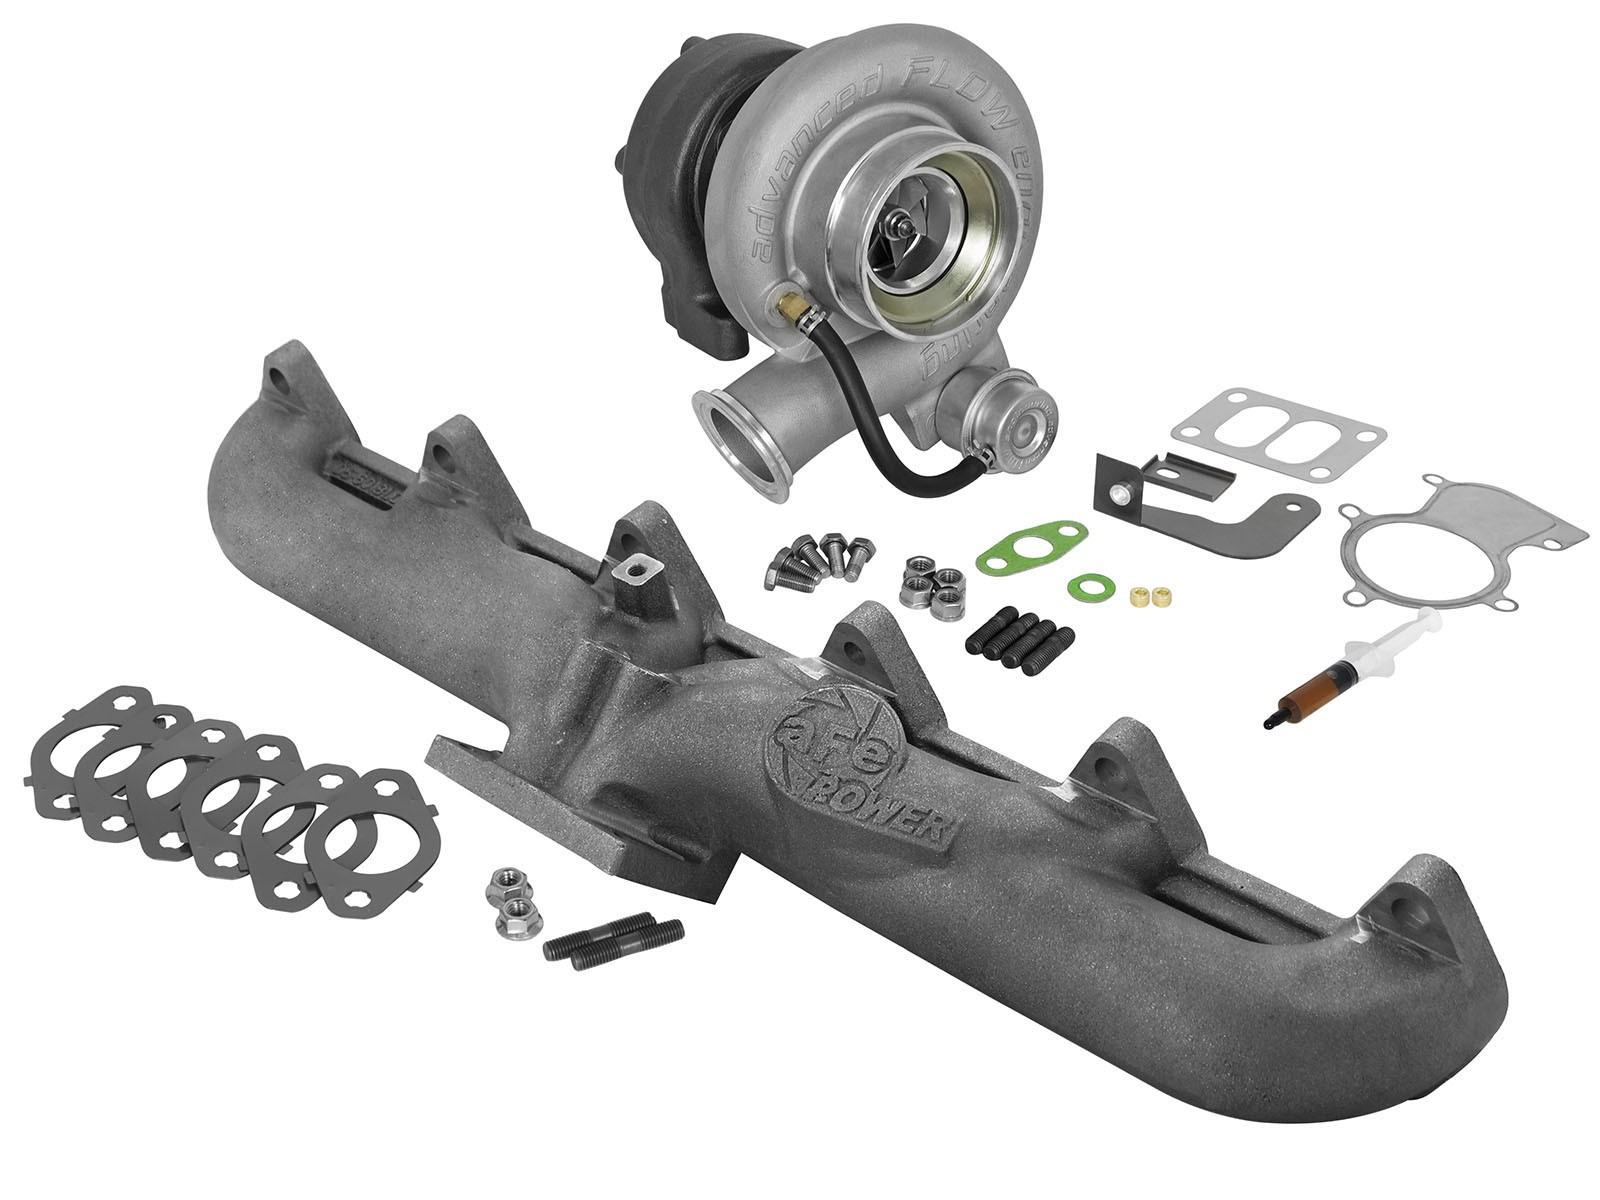 aFe POWER 46-60060-MB BladeRunner Street Series Turbocharger w/ Exhaust Manifold